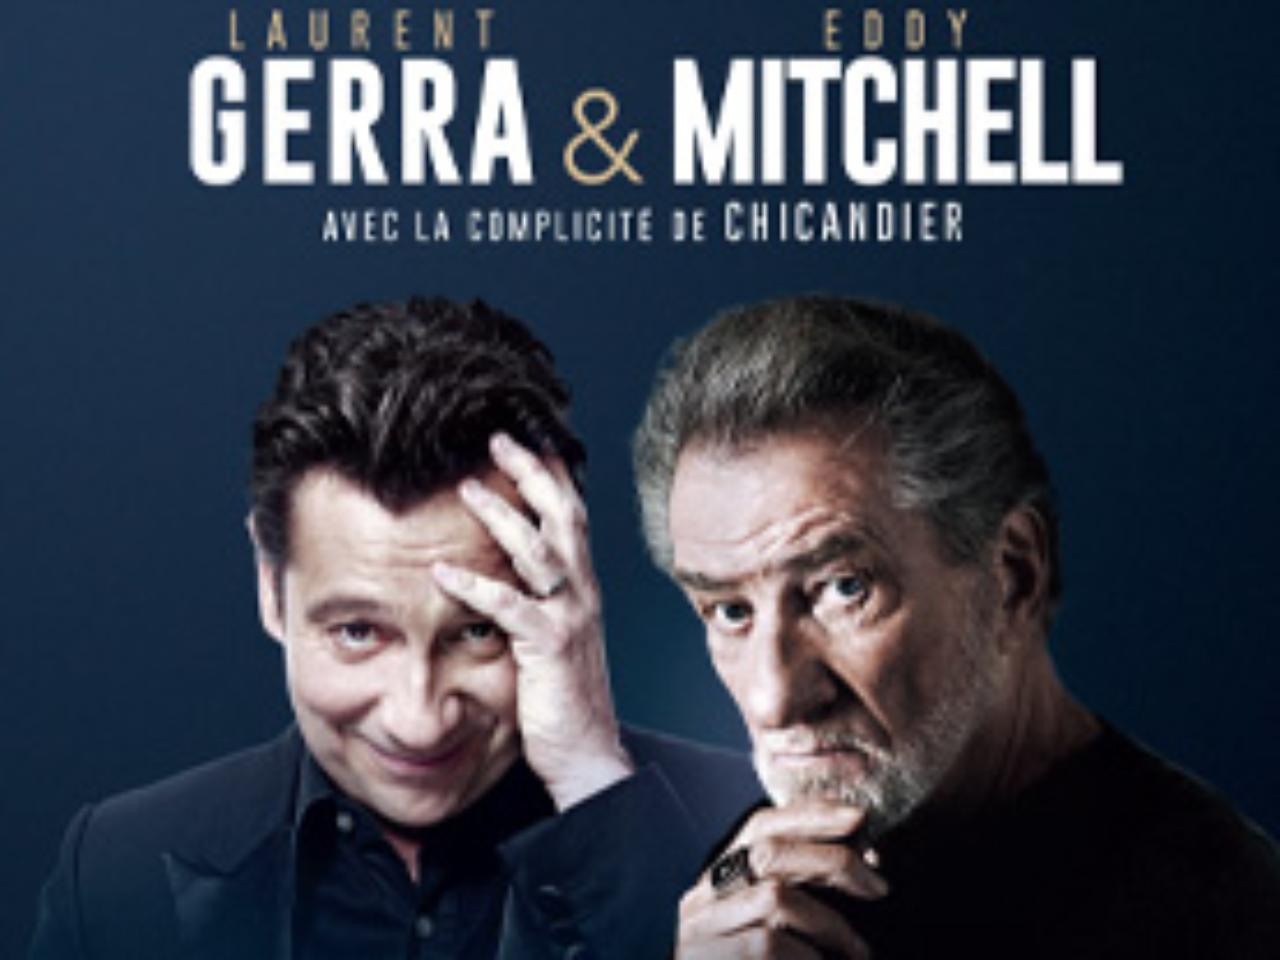 a-credit-et-en-stereo-gerra-mitchell-96b-mini